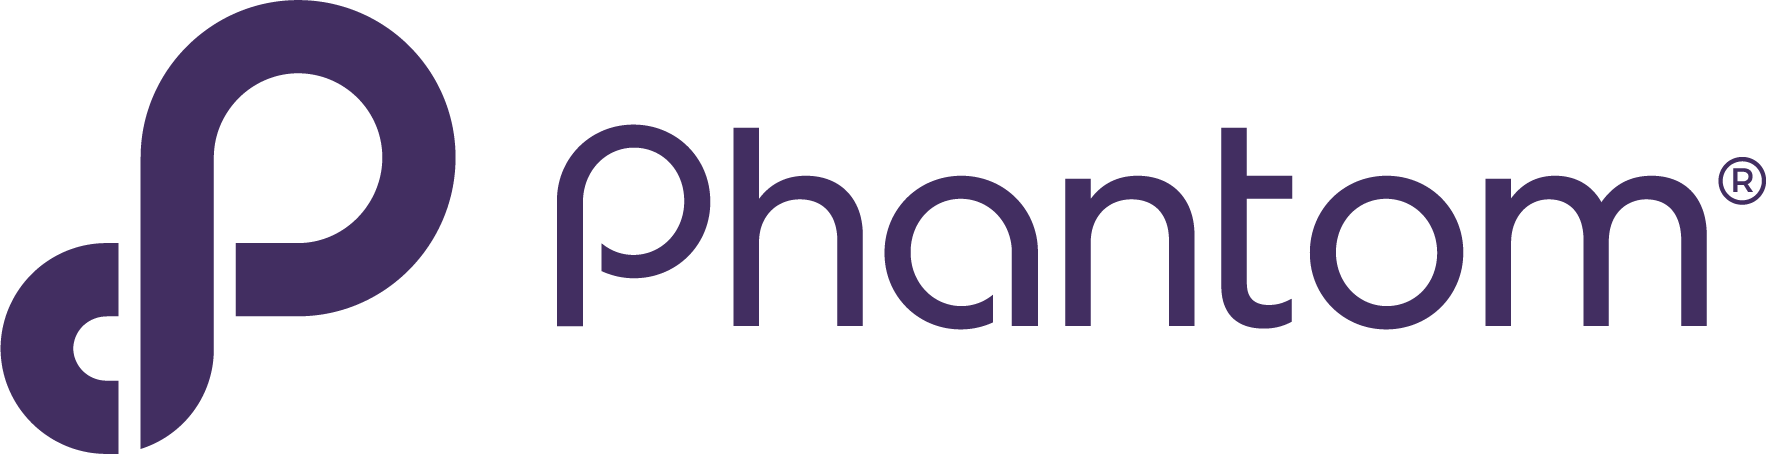 Phantom Competitors, Revenue and Employees - Owler Company Profile